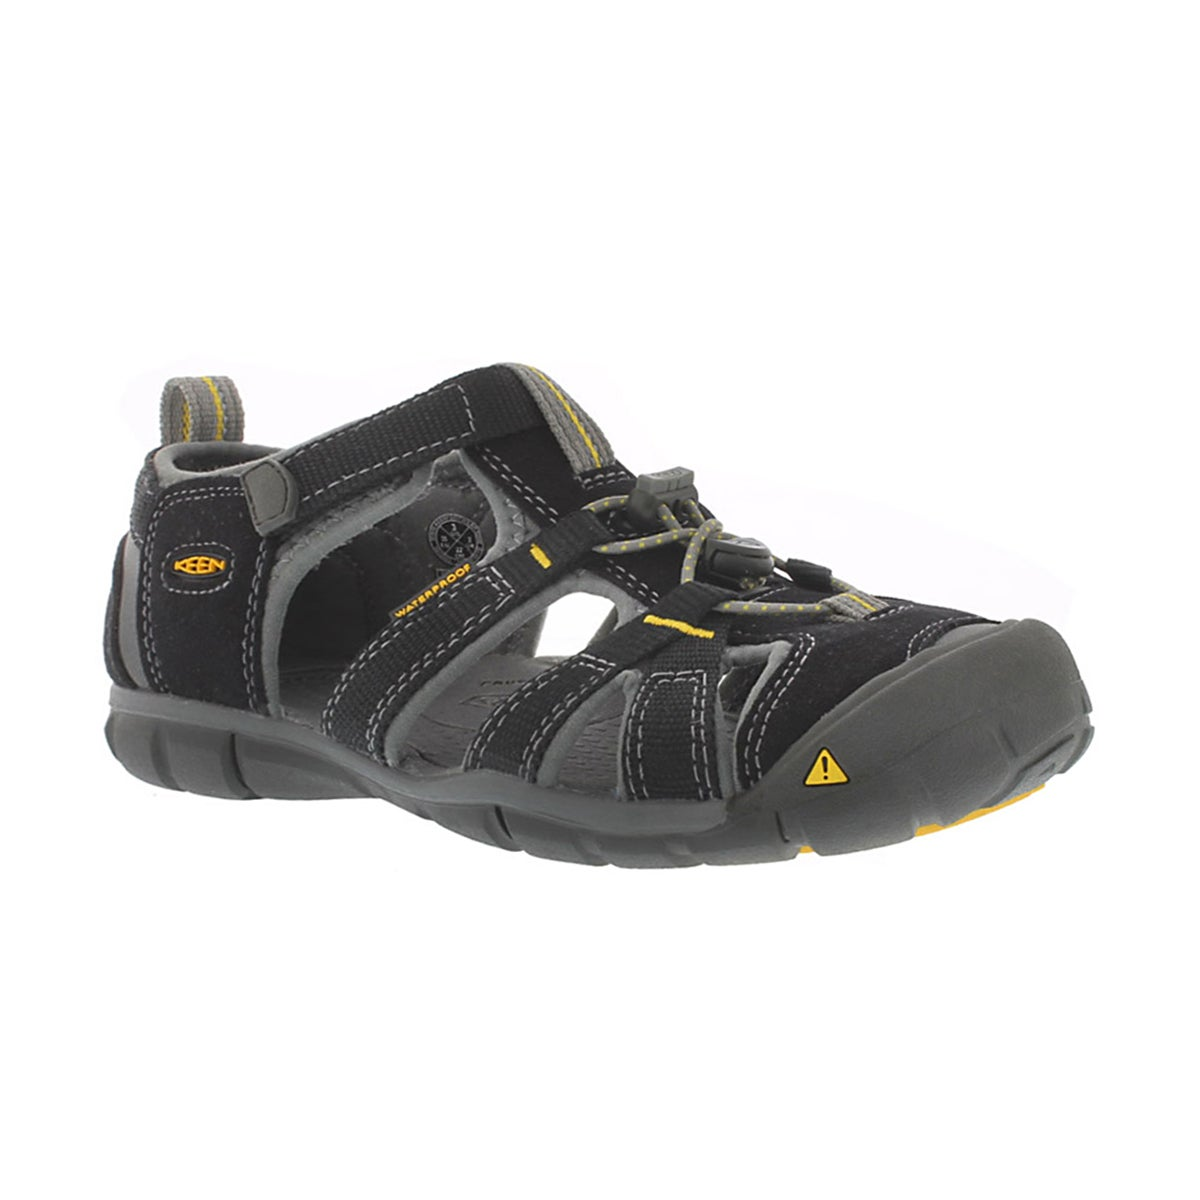 Sandales SeacampIICNX, noir/jaune, garç